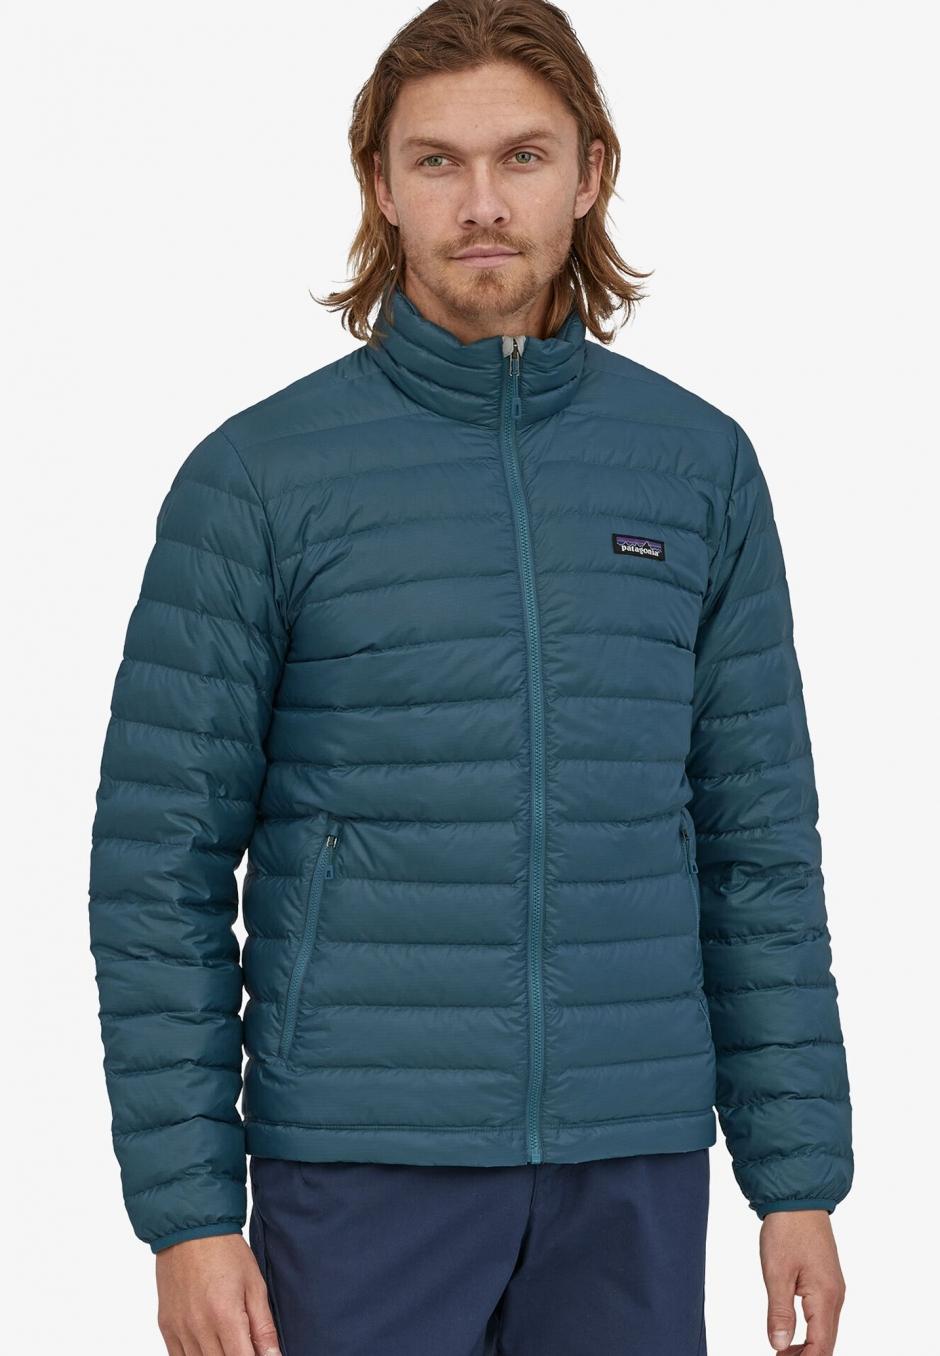 Patagonia M's Down Sweater Jacket